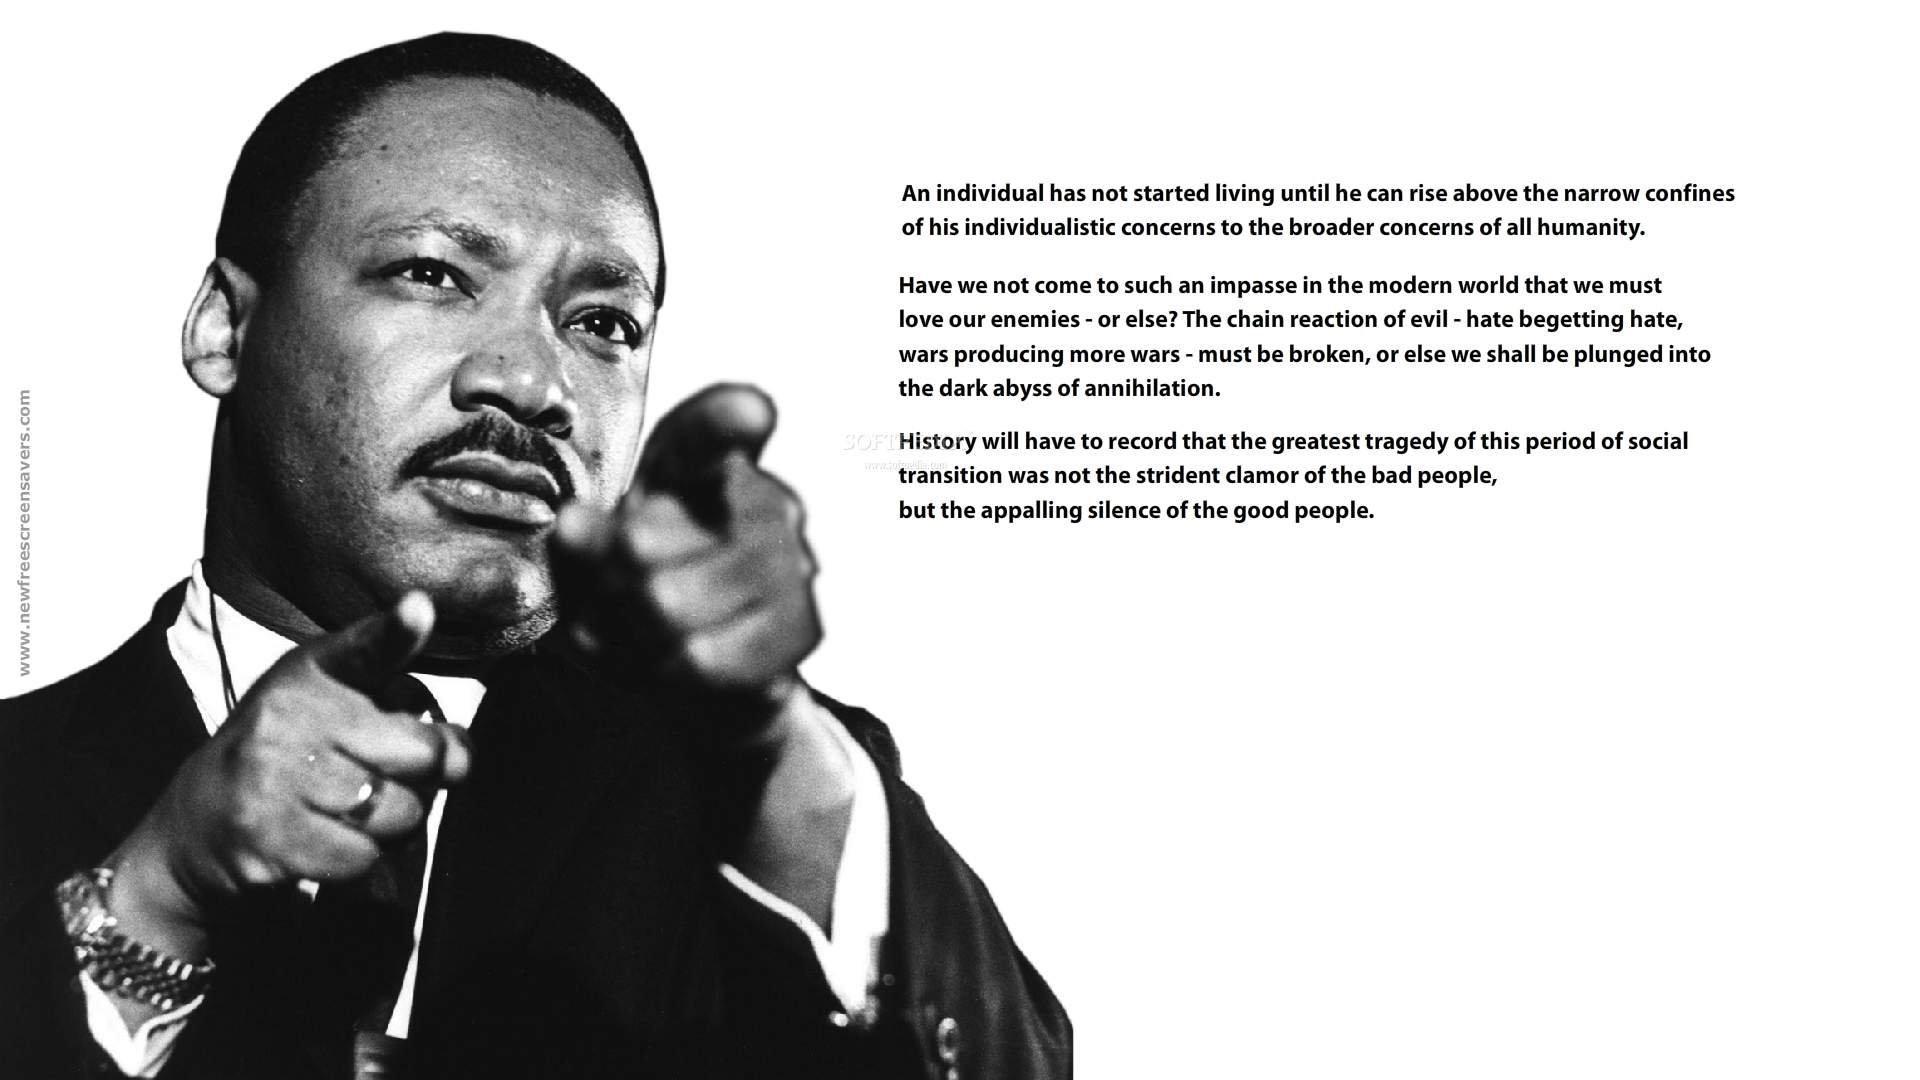 JR negro african american civil rights political poster (6) wallpaper .